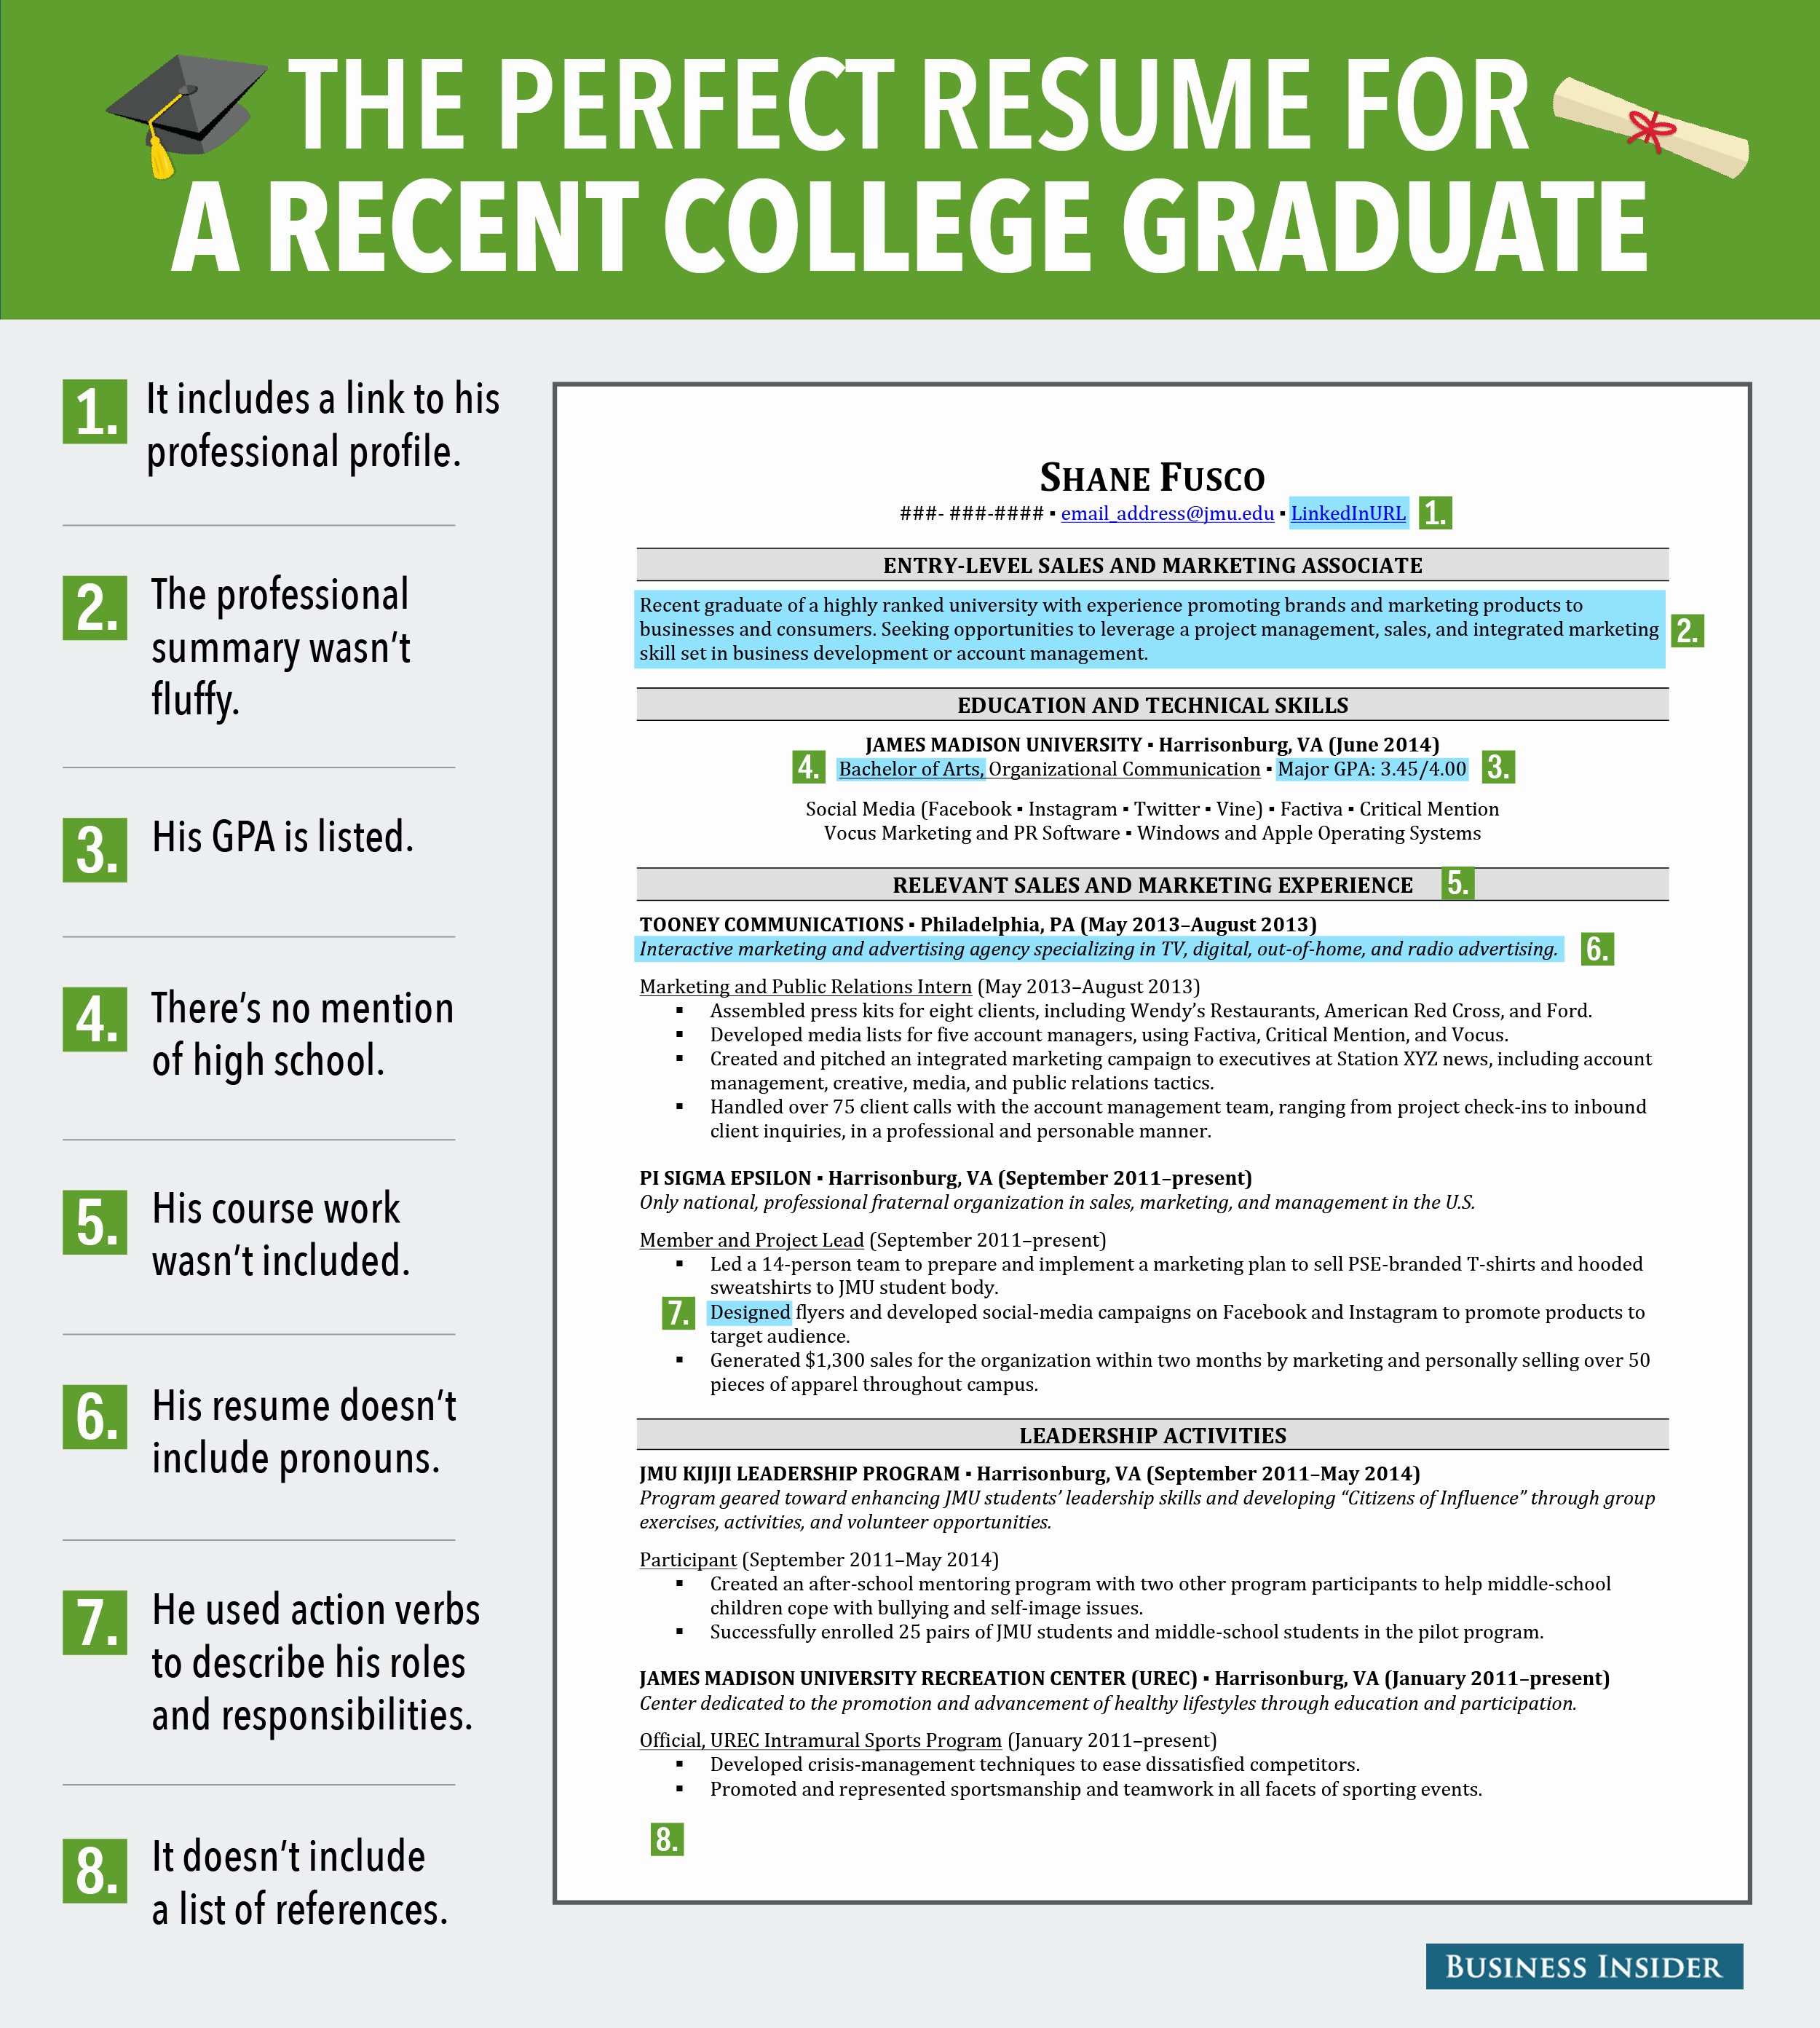 excellent resume for recent grad 2014 7